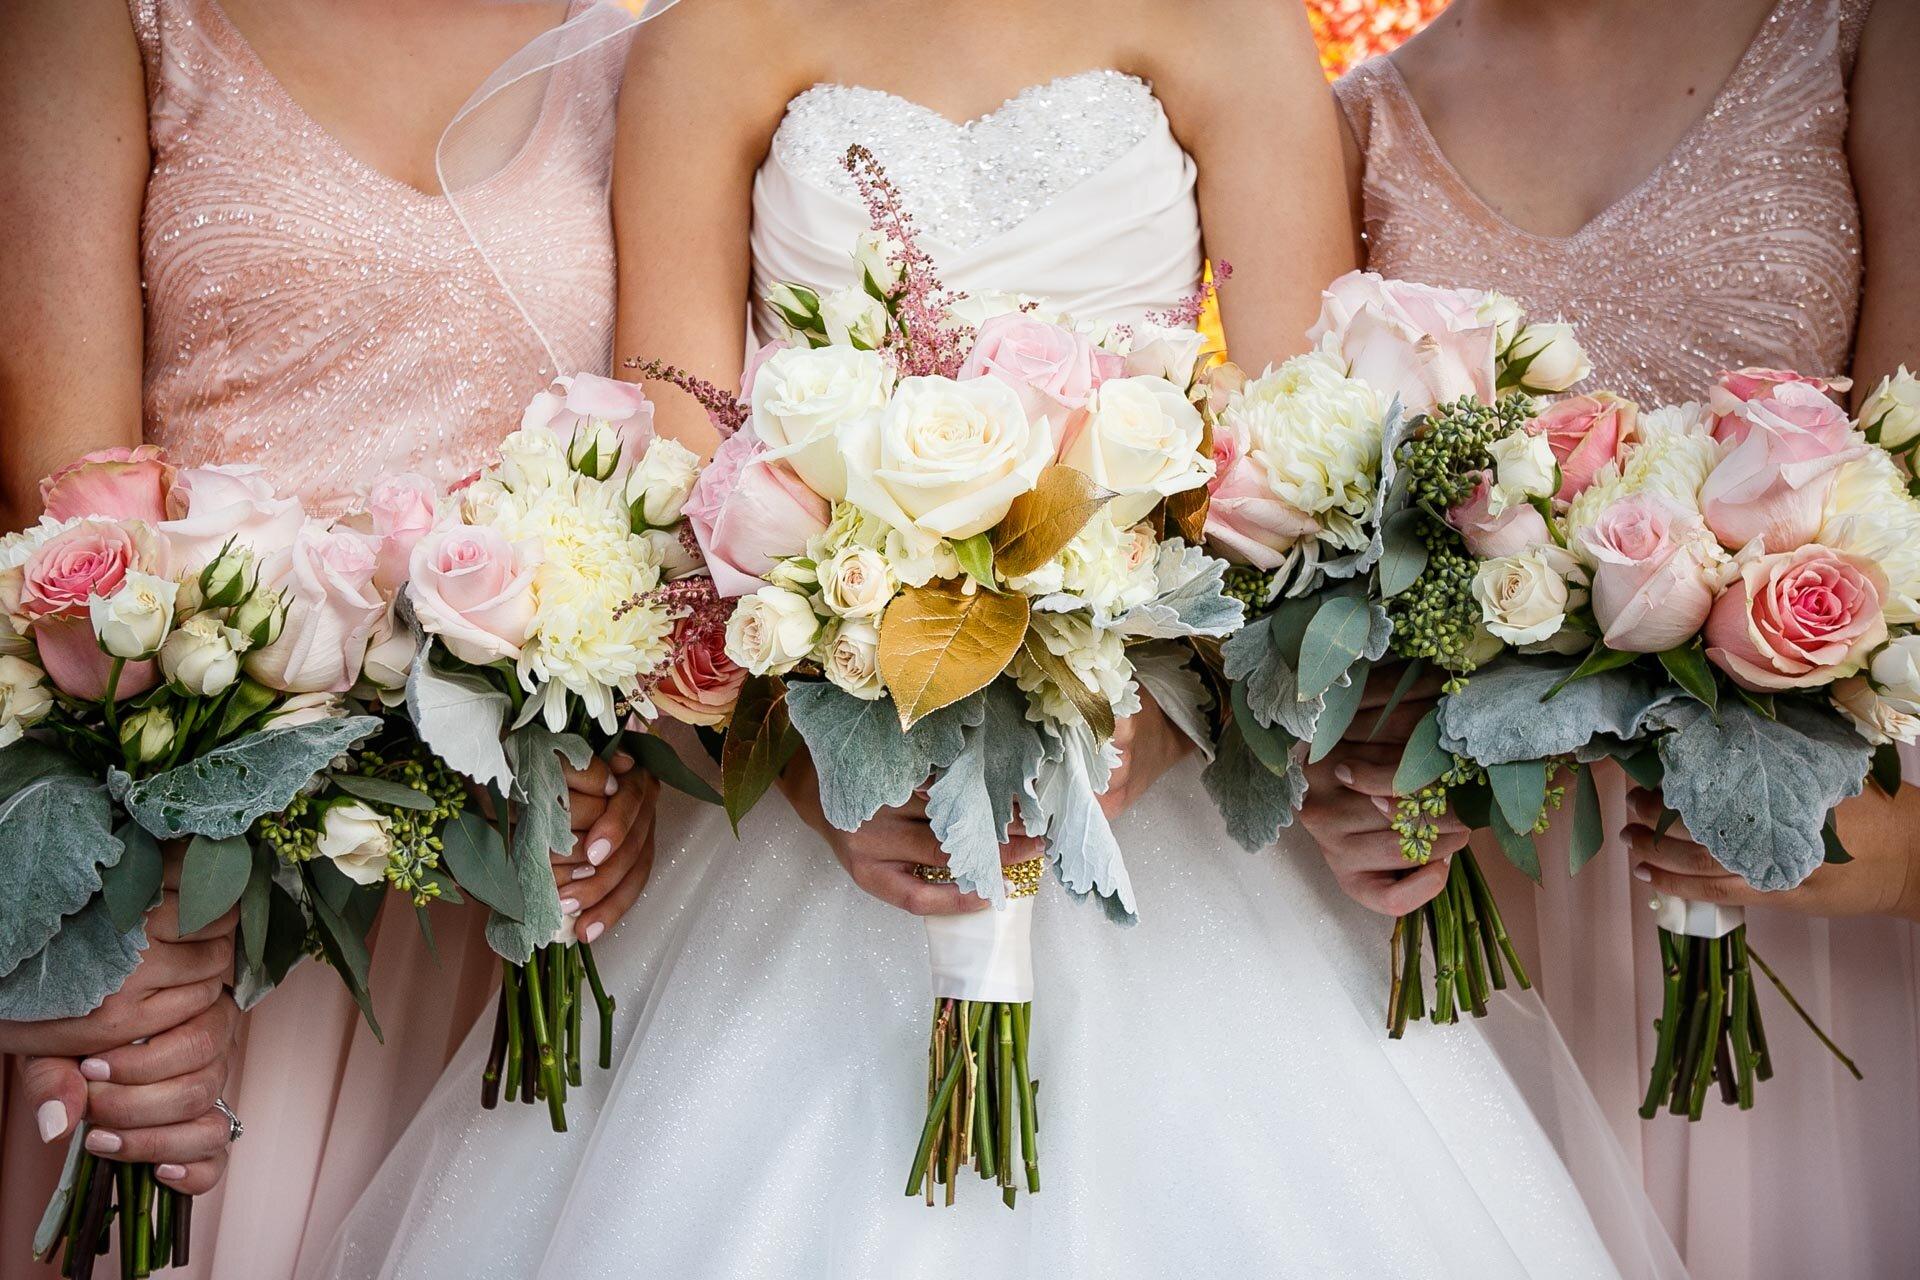 adam-shea-photography-fall-autumn-lighting-engagement-wedding-photos-adam-shea-photography-green-bay-appleton-neenah-photographer-07.jpg